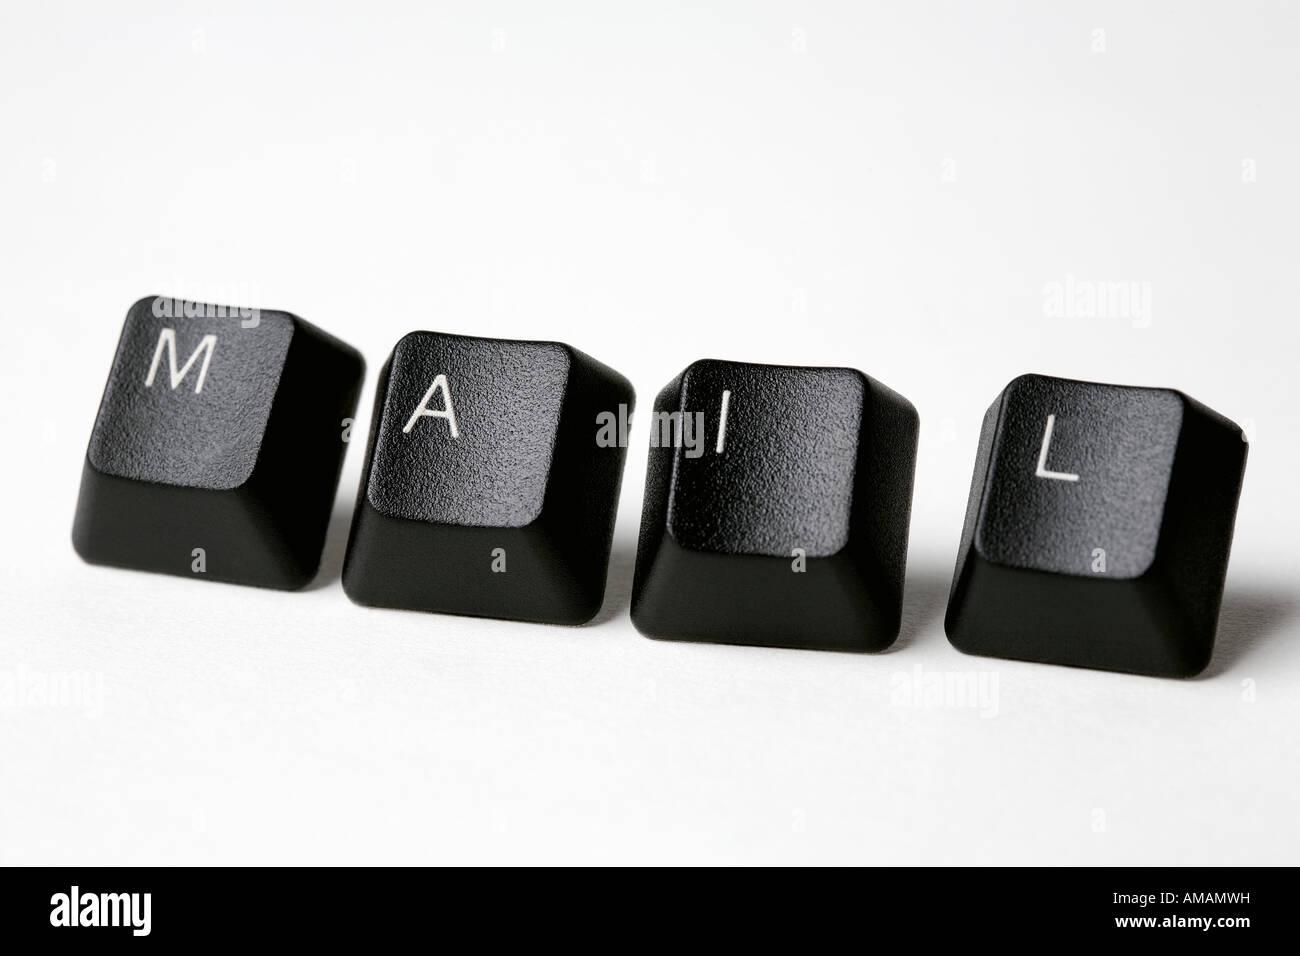 Computer keys spelling 'Mail' - Stock Image